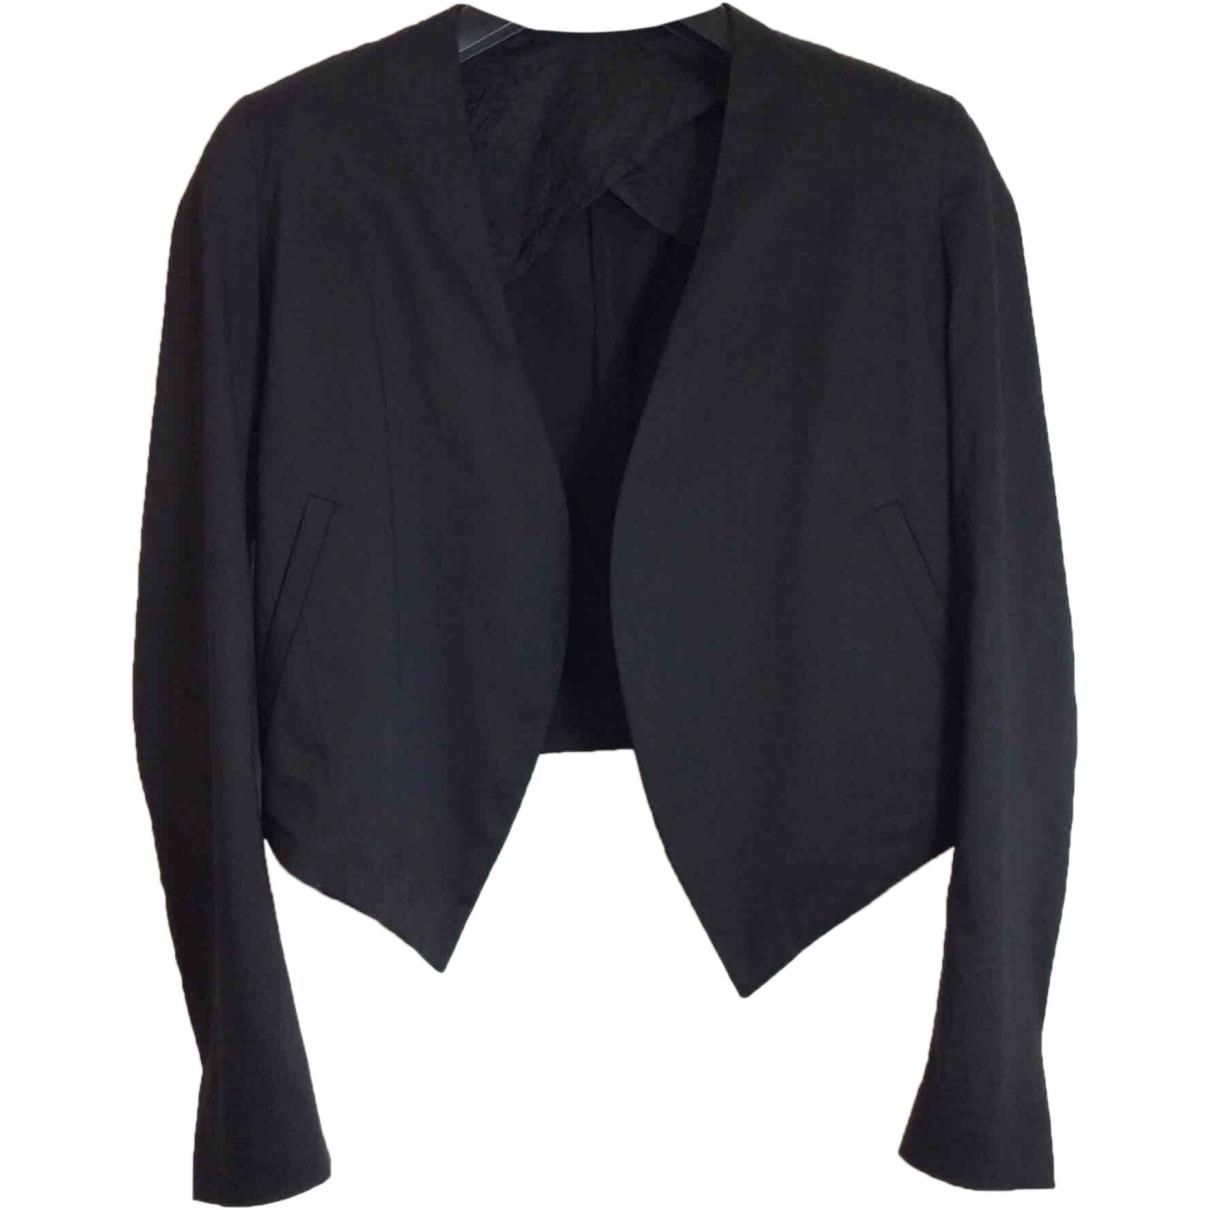 Acne Studios \N Black Cotton jacket for Women 36 FR